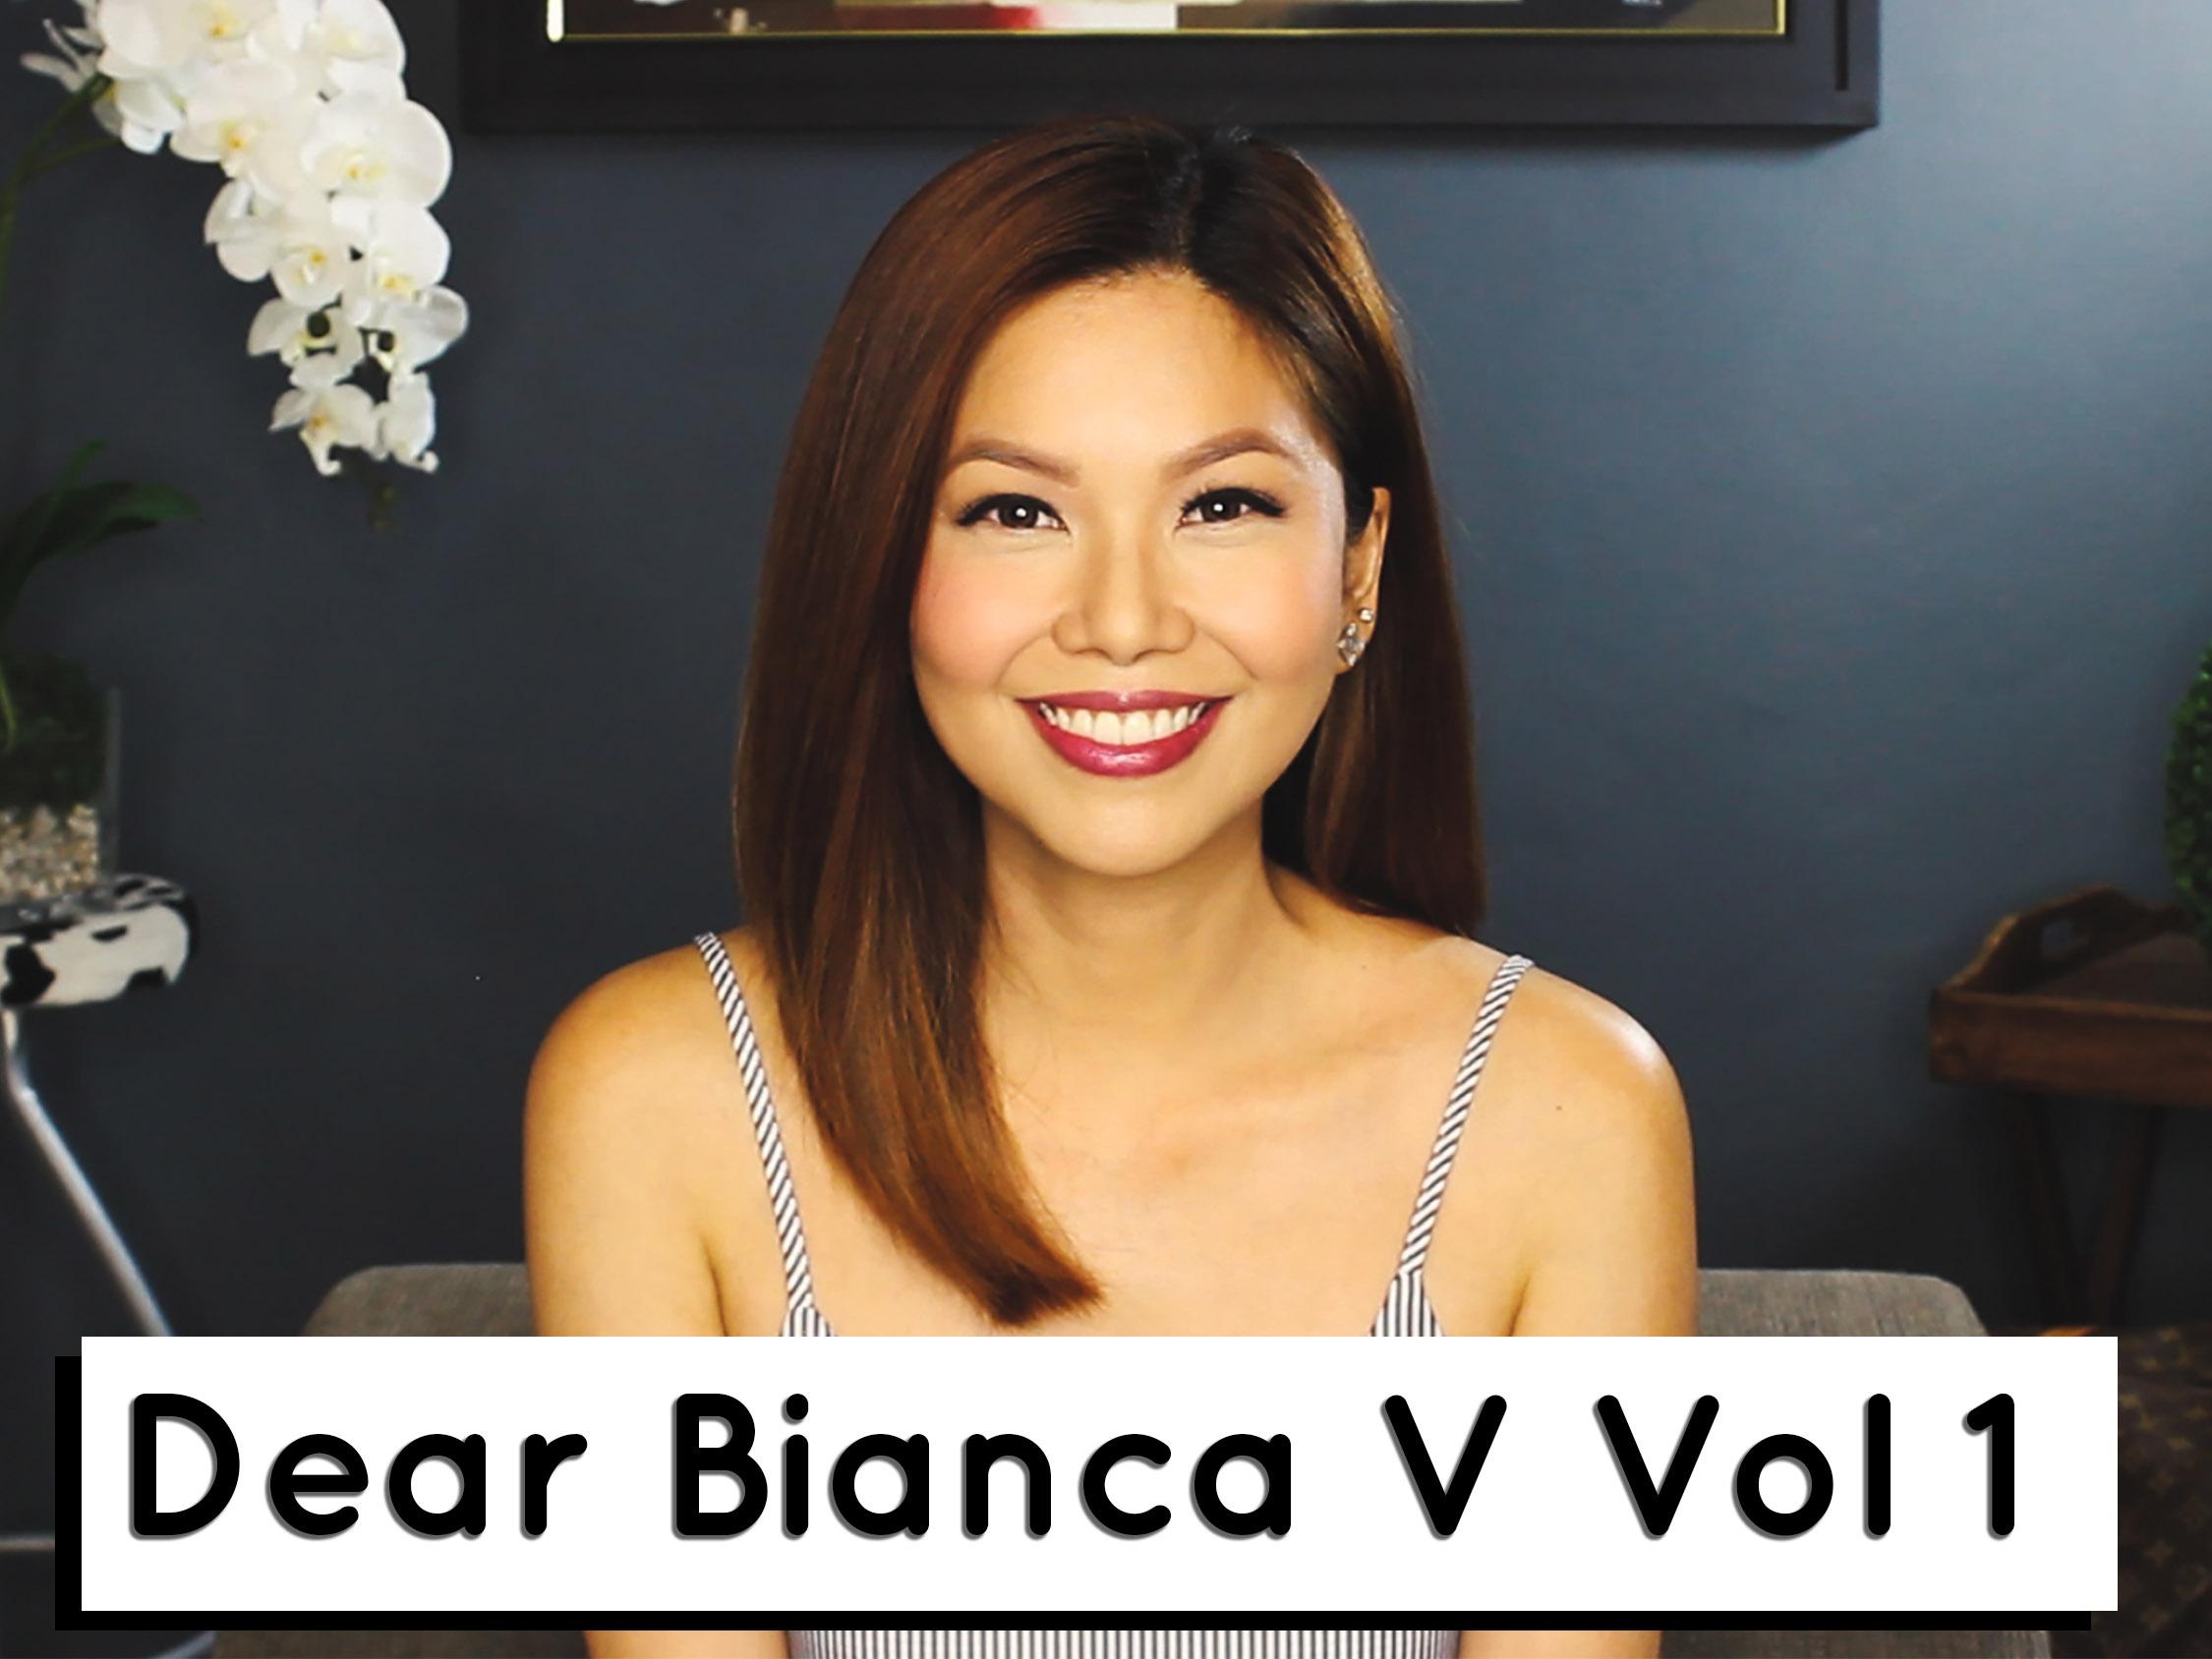 Bianca Valerio #DearBiancaV